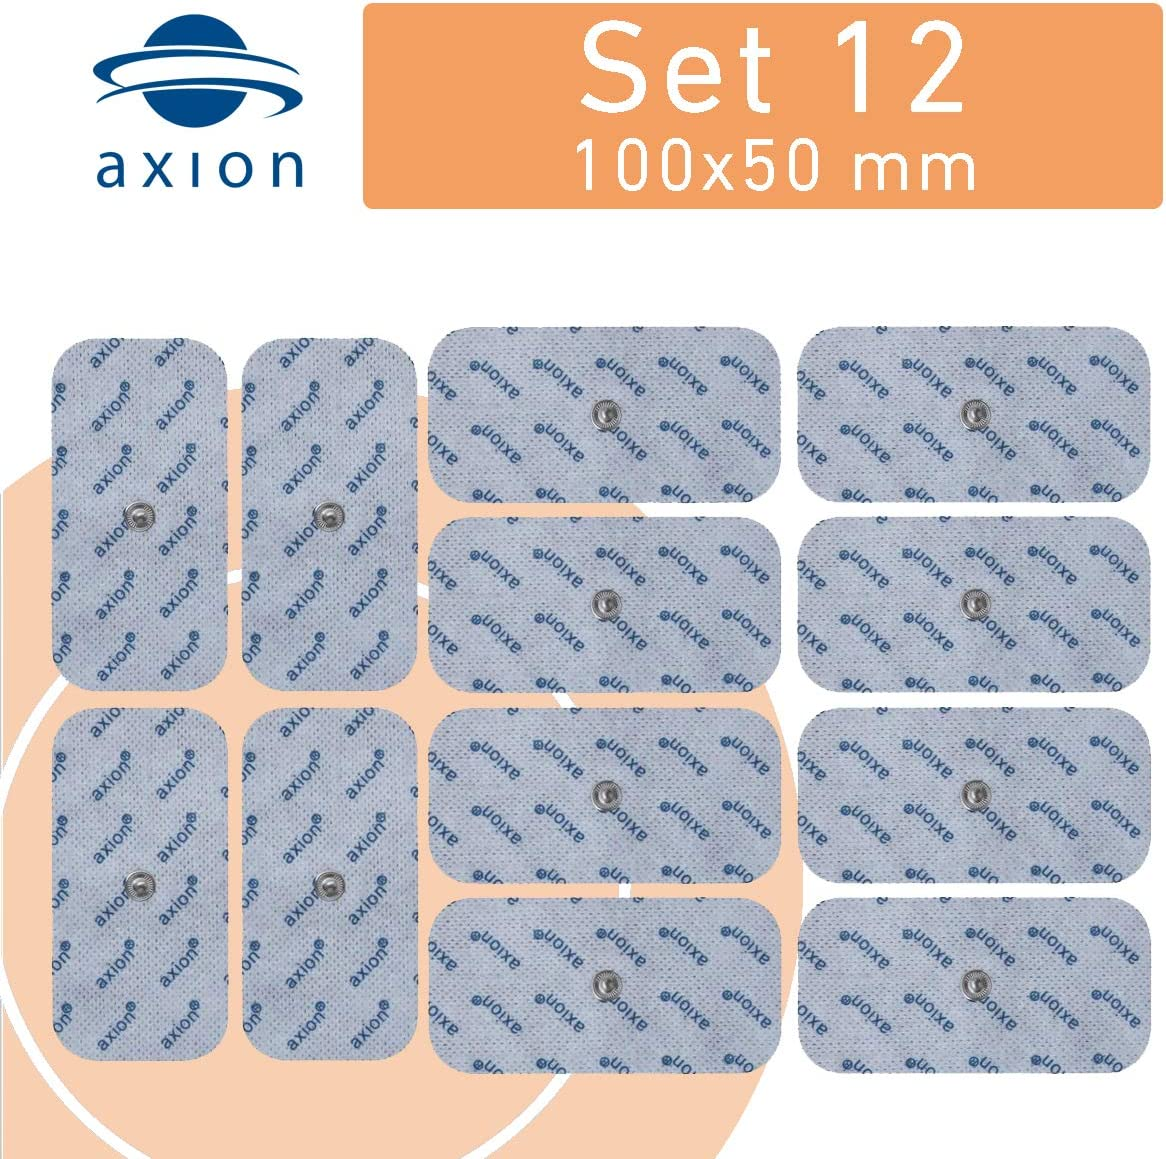 12 Electrodos de 10x5 cm - para su aparato TENS EMS electroestimulador VITALCONTROL & Beurer - axion